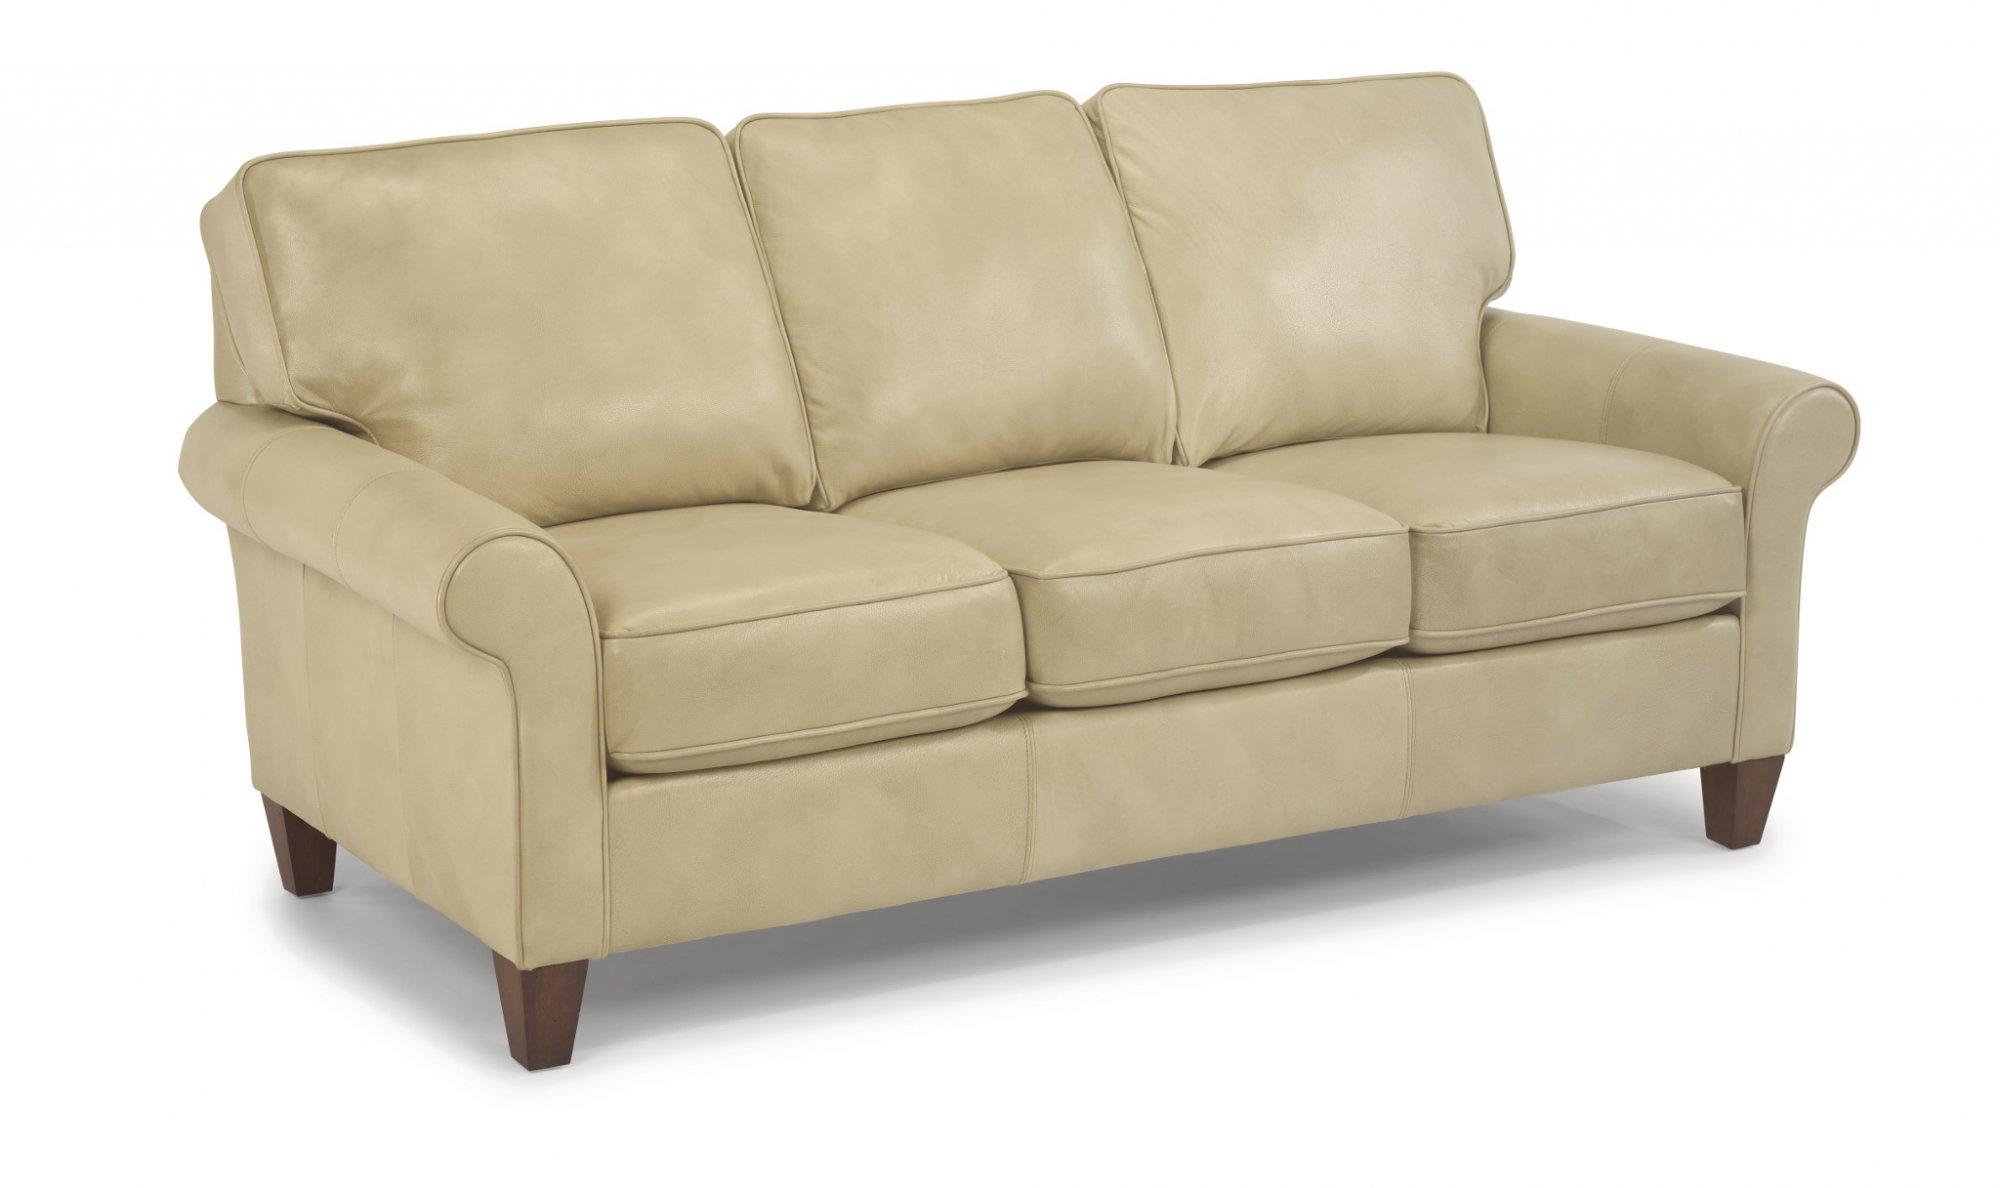 Peachy Flexsteel 3979 30 Westside Leather Sofa Highway Unemploymentrelief Wooden Chair Designs For Living Room Unemploymentrelieforg